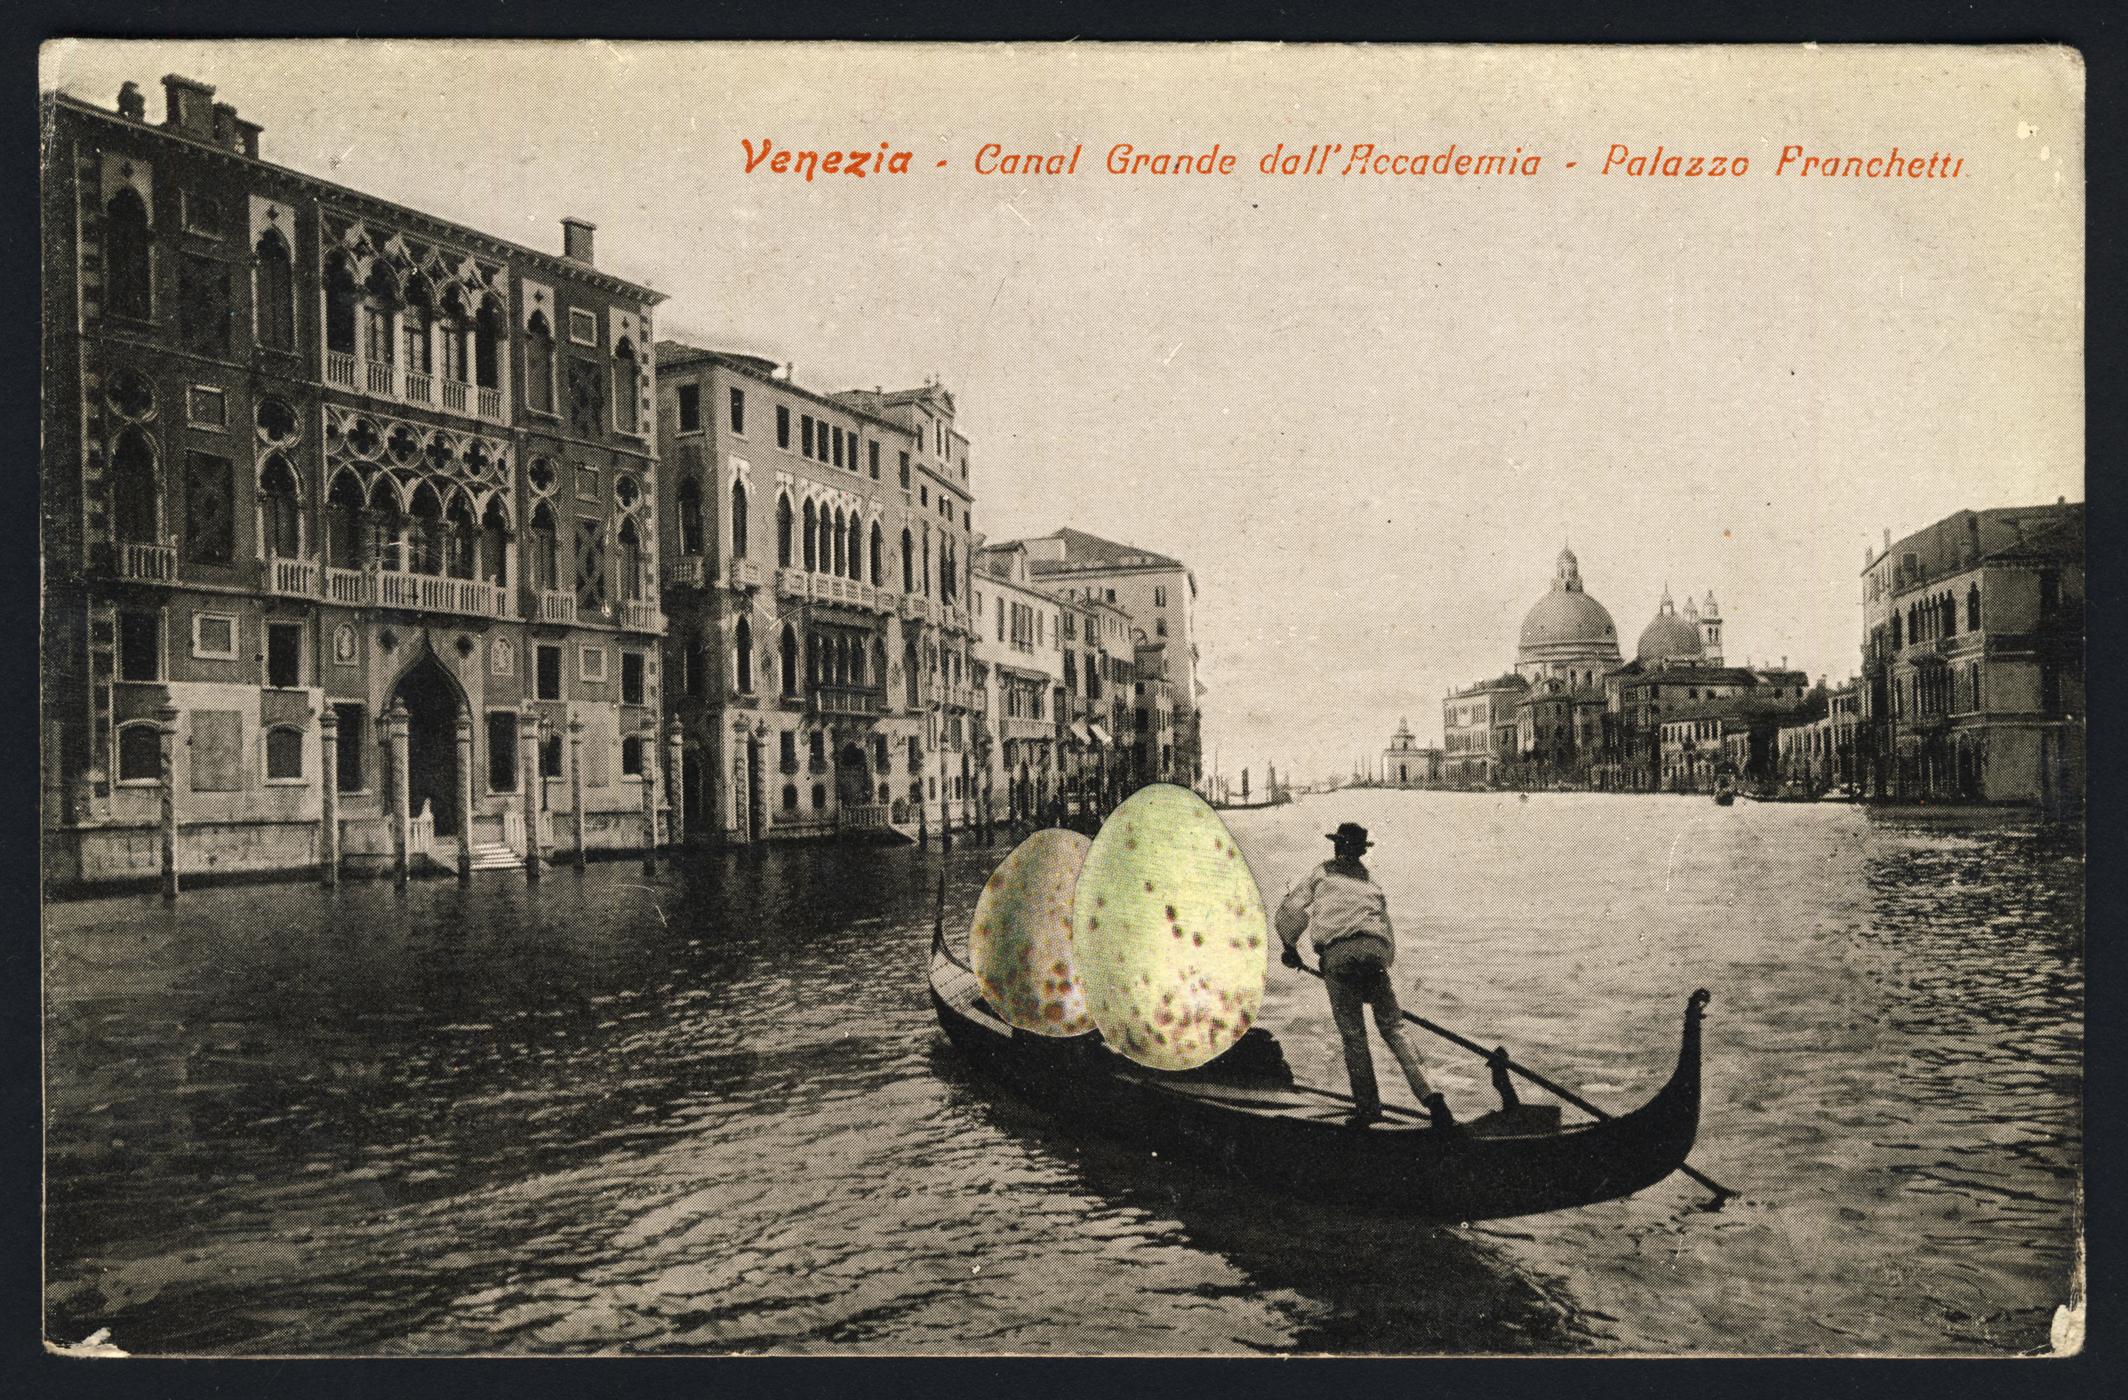 EGGGONDOLA 2019 Collage and Retouching fluid on vintage postcard 9x14cm KEELERTORNERO